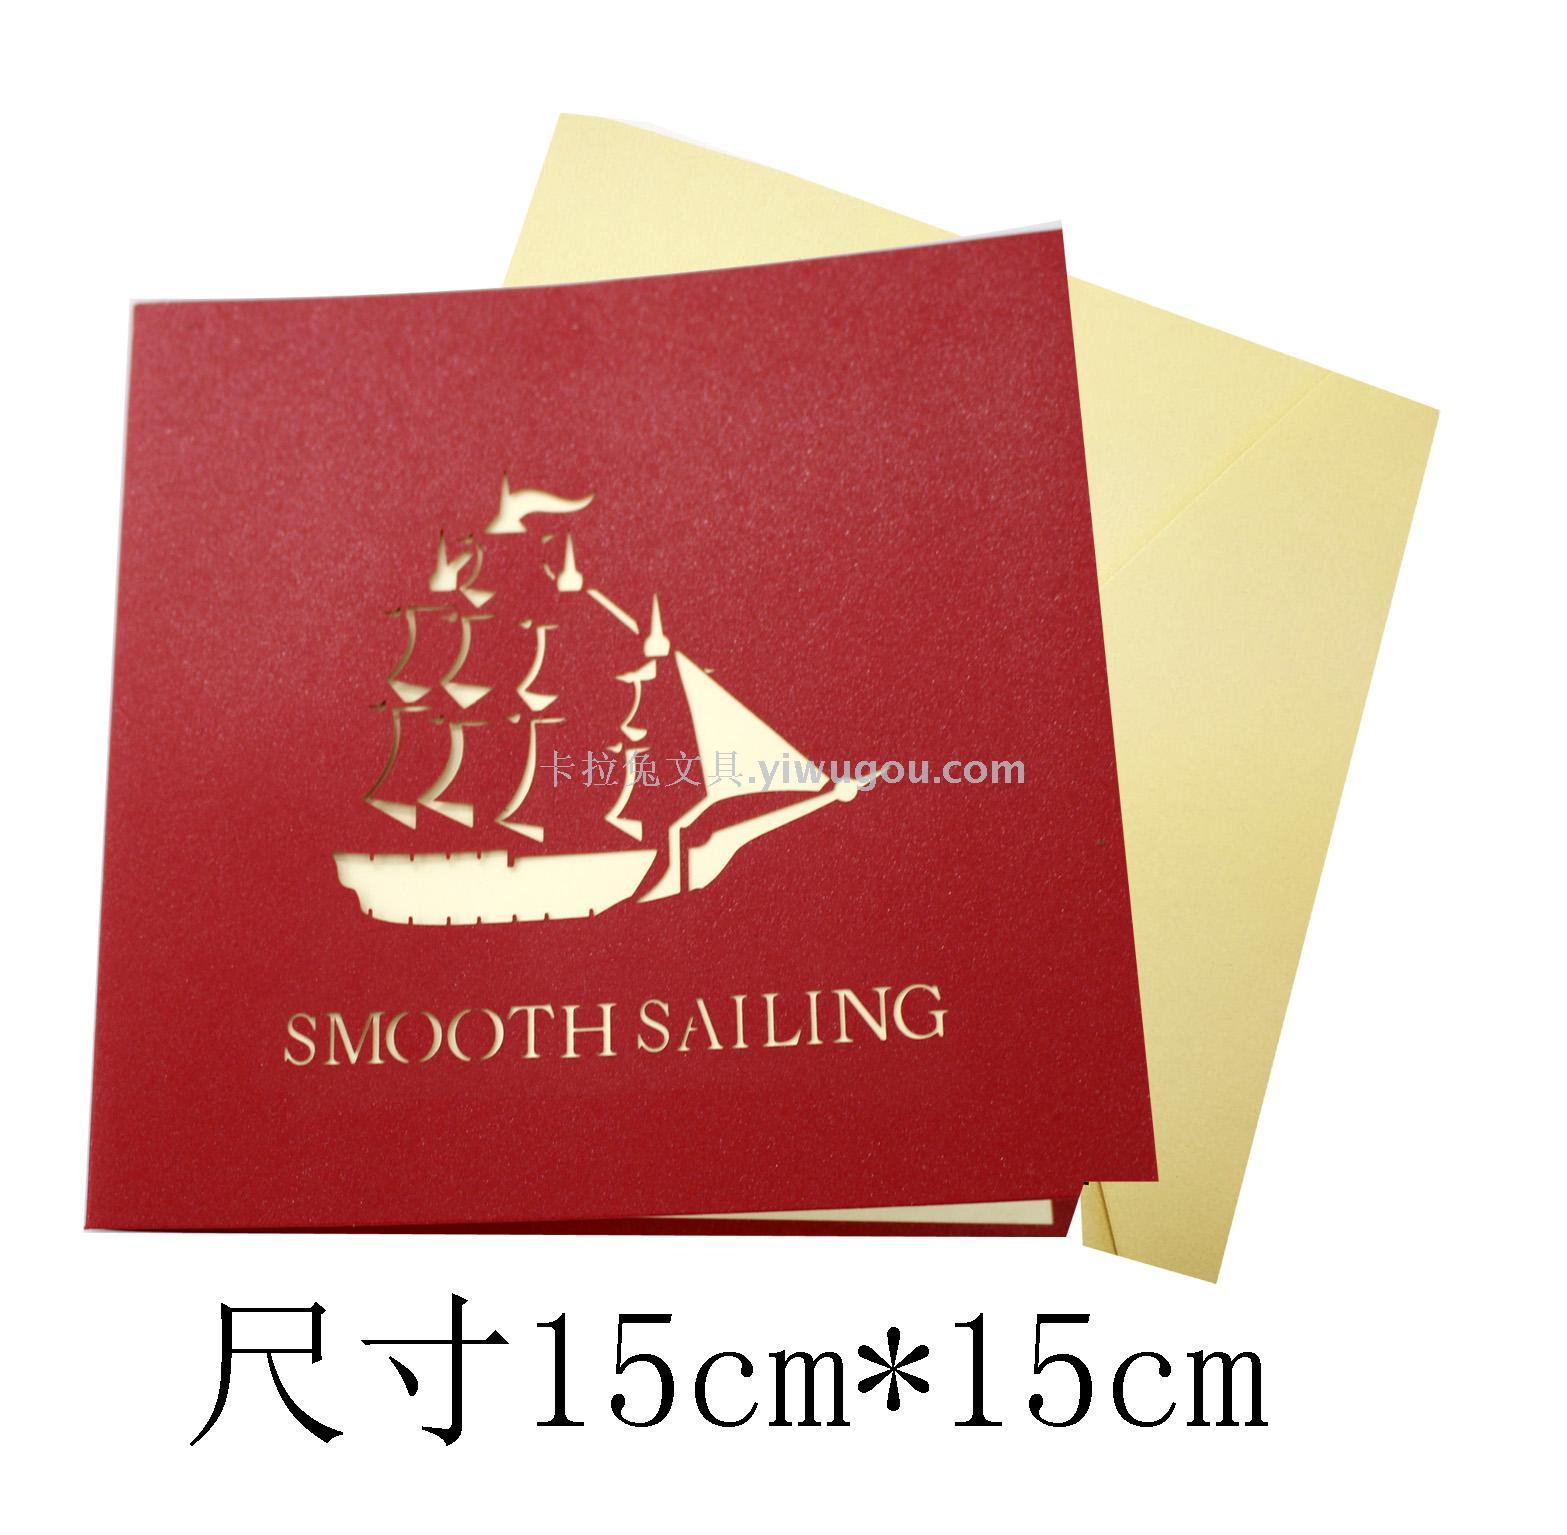 Mayanyan Creative 3D Three-Dimensional Handmade Paper Carving Business Blessing Card Sailing Holiday Greeting Card Smooth Gift 10 Photos